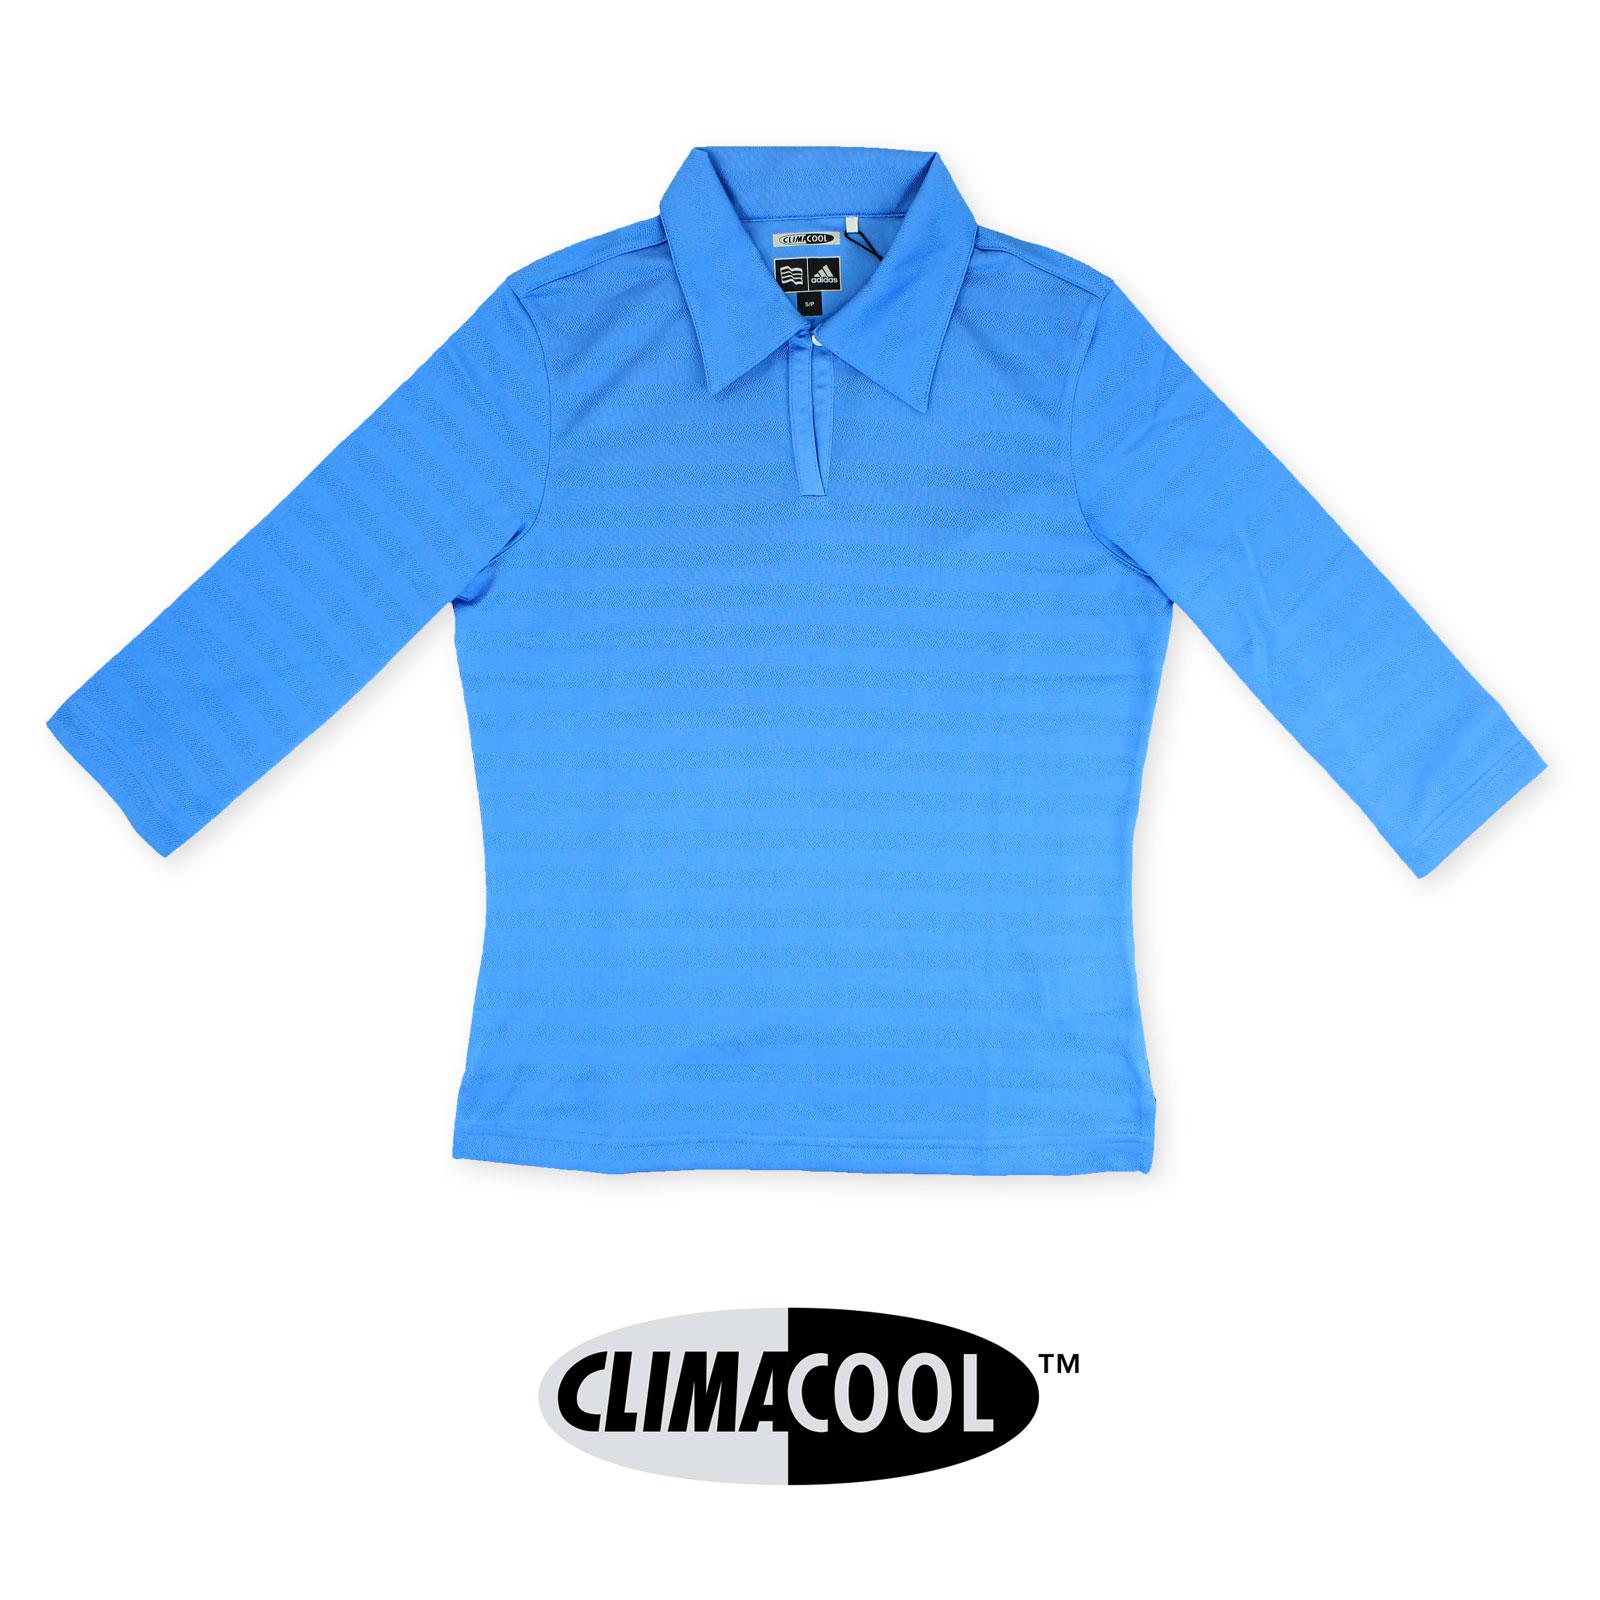 e1fd56df ADIDAS Ladies Womens Blue Golf Polo Shirt Top Climacool Coolmax Size ...